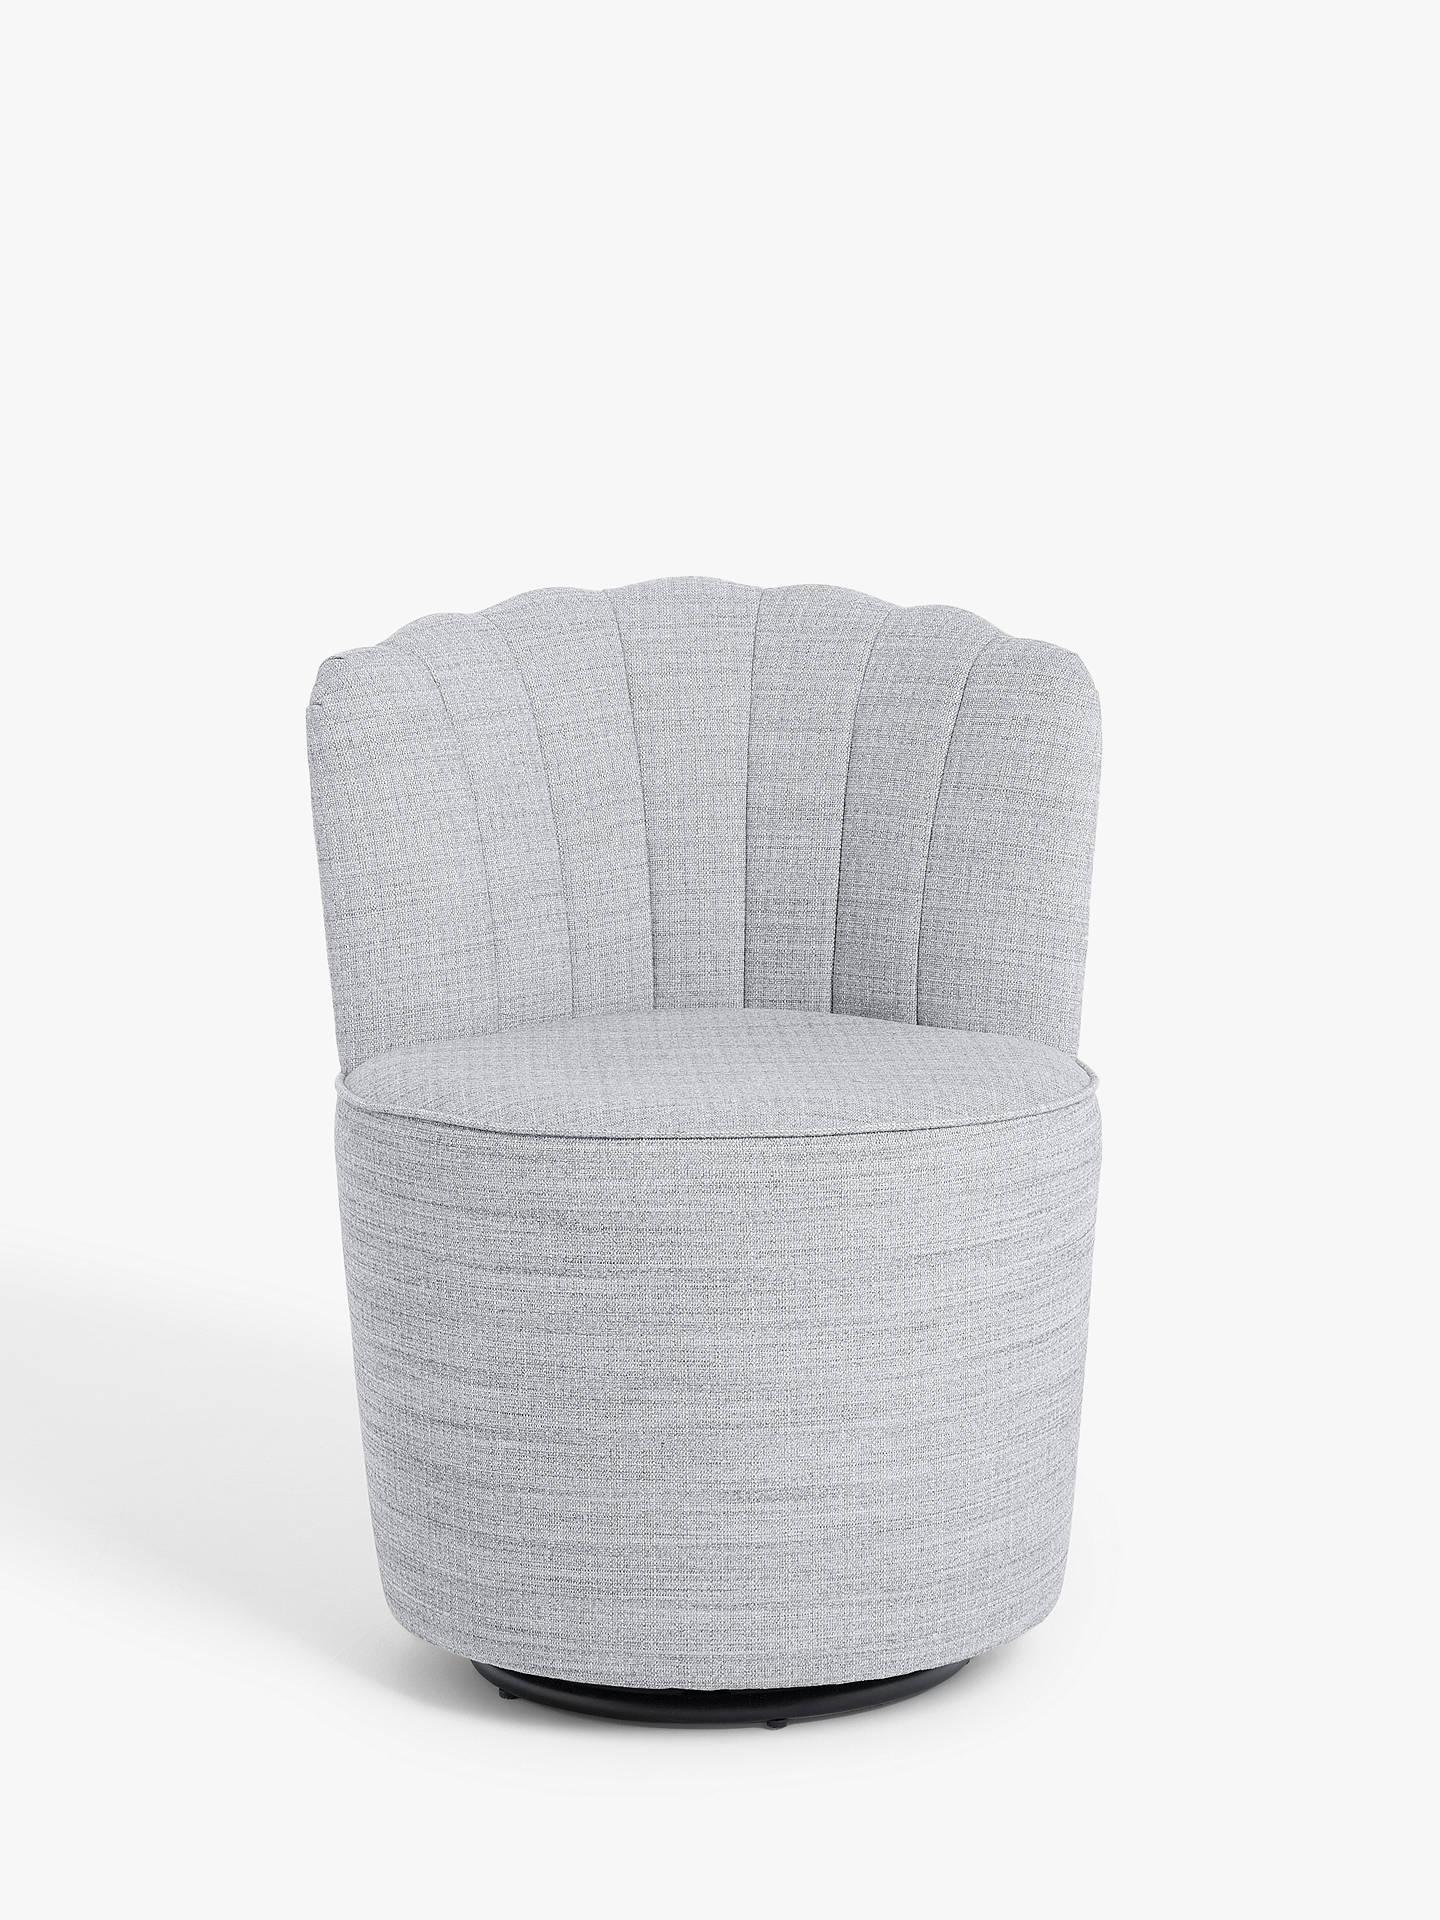 Wondrous John Lewis Partners Pirouette Swivel Accent Armchair Lucca Soft Teal Velvet Lamtechconsult Wood Chair Design Ideas Lamtechconsultcom